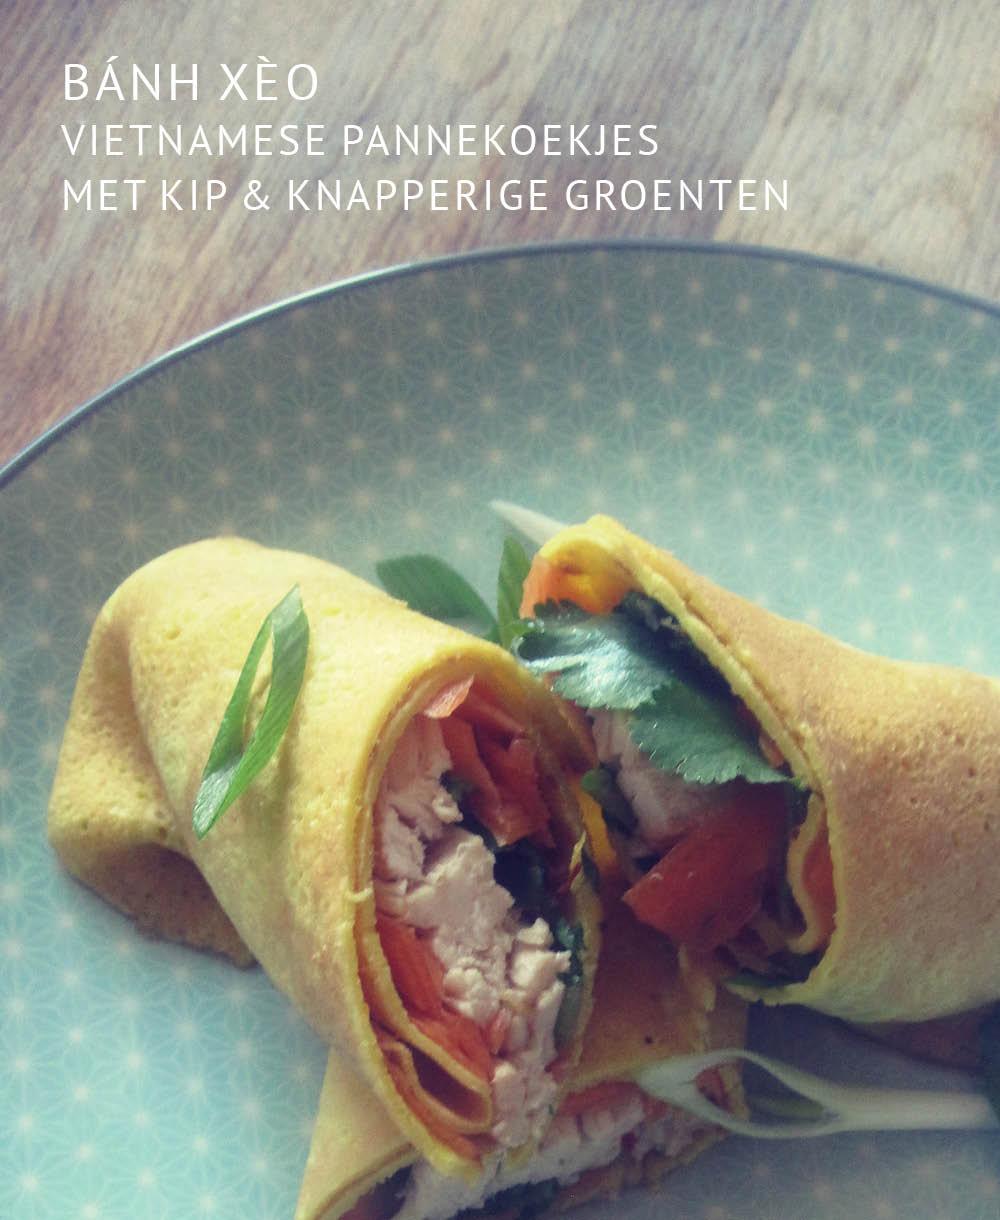 Empty the Fridge - Vietnamese pannekoekjes met kip en knapperige groenten